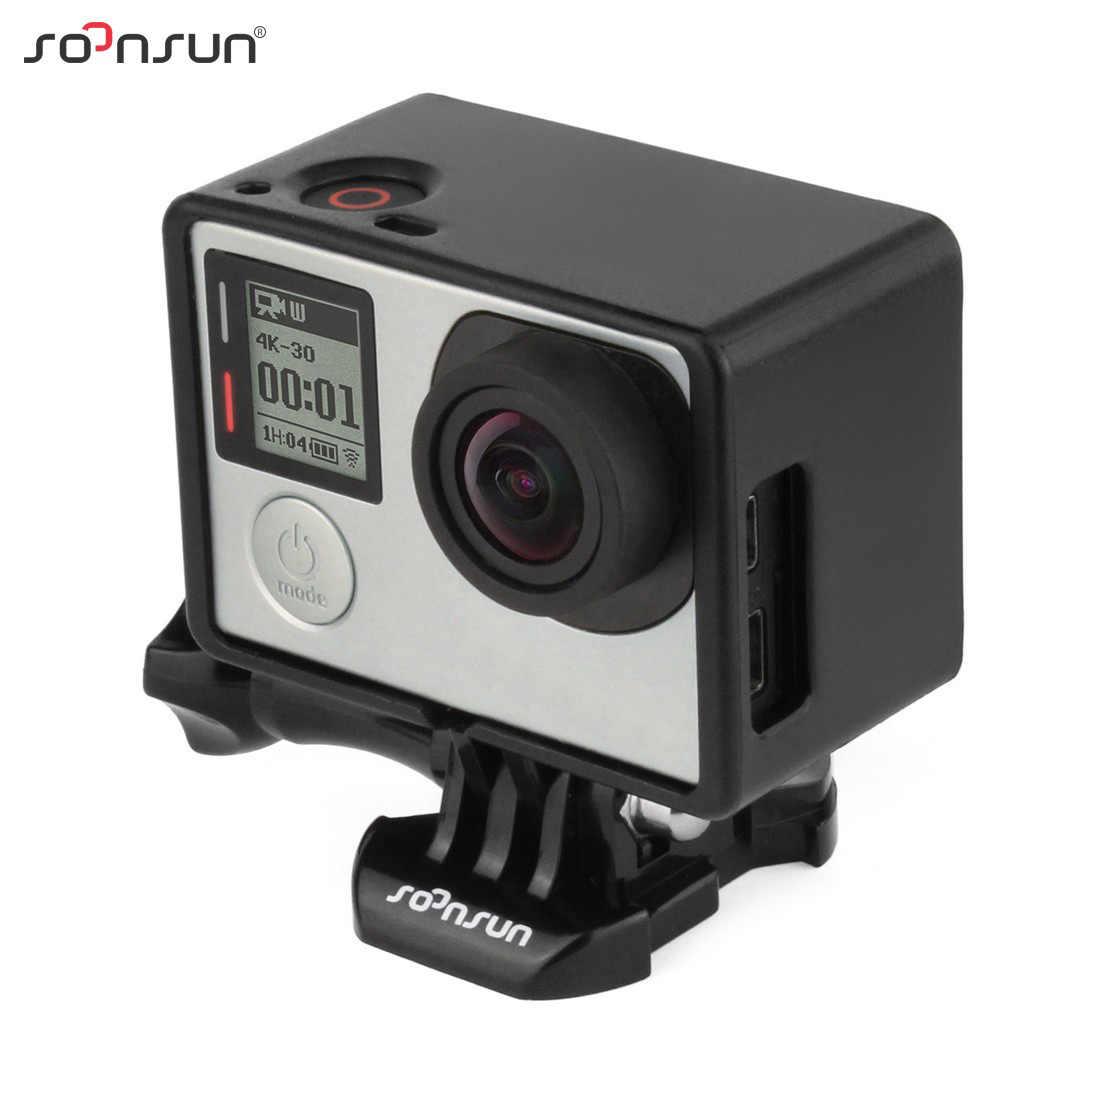 SOONSUN กรอบขยายสำหรับ Bacpac w/หัวเข็มขัดและสกรูสำหรับ Gopro Hero 3 3 + 4 กล้องสำหรับ Go Pro อุปกรณ์เสริม